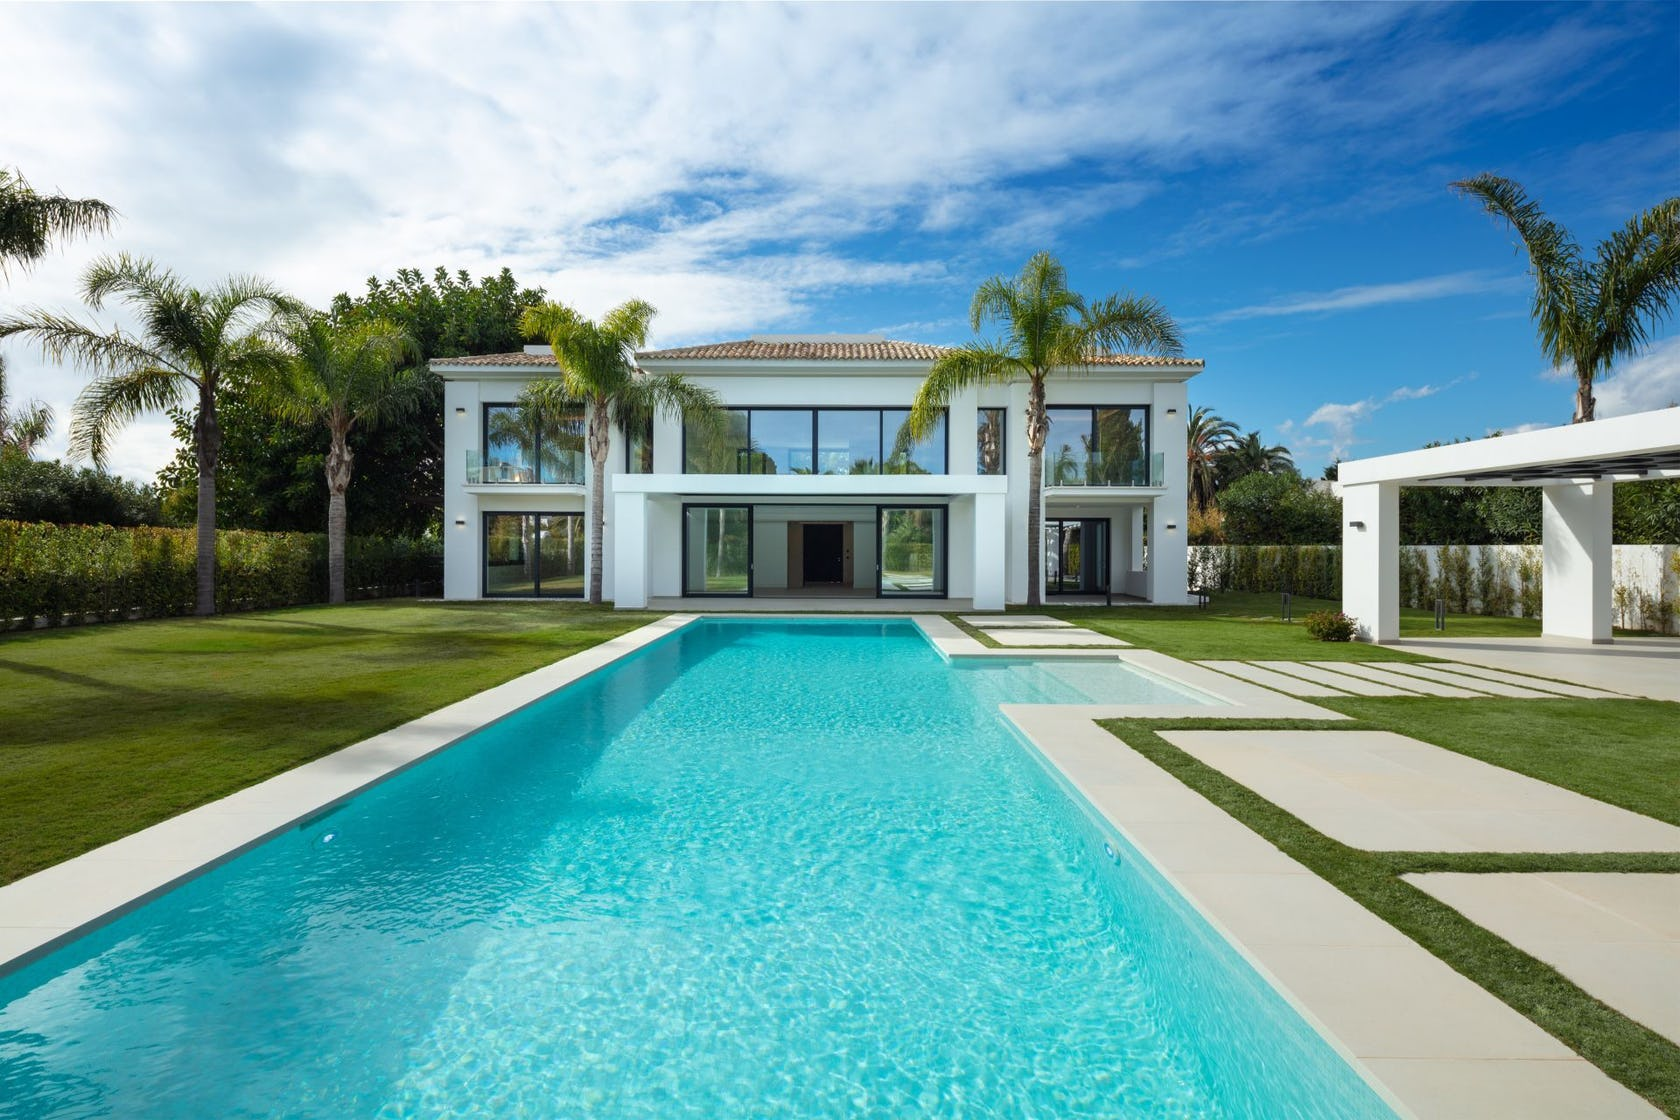 villa housing building house pool water swimming pool